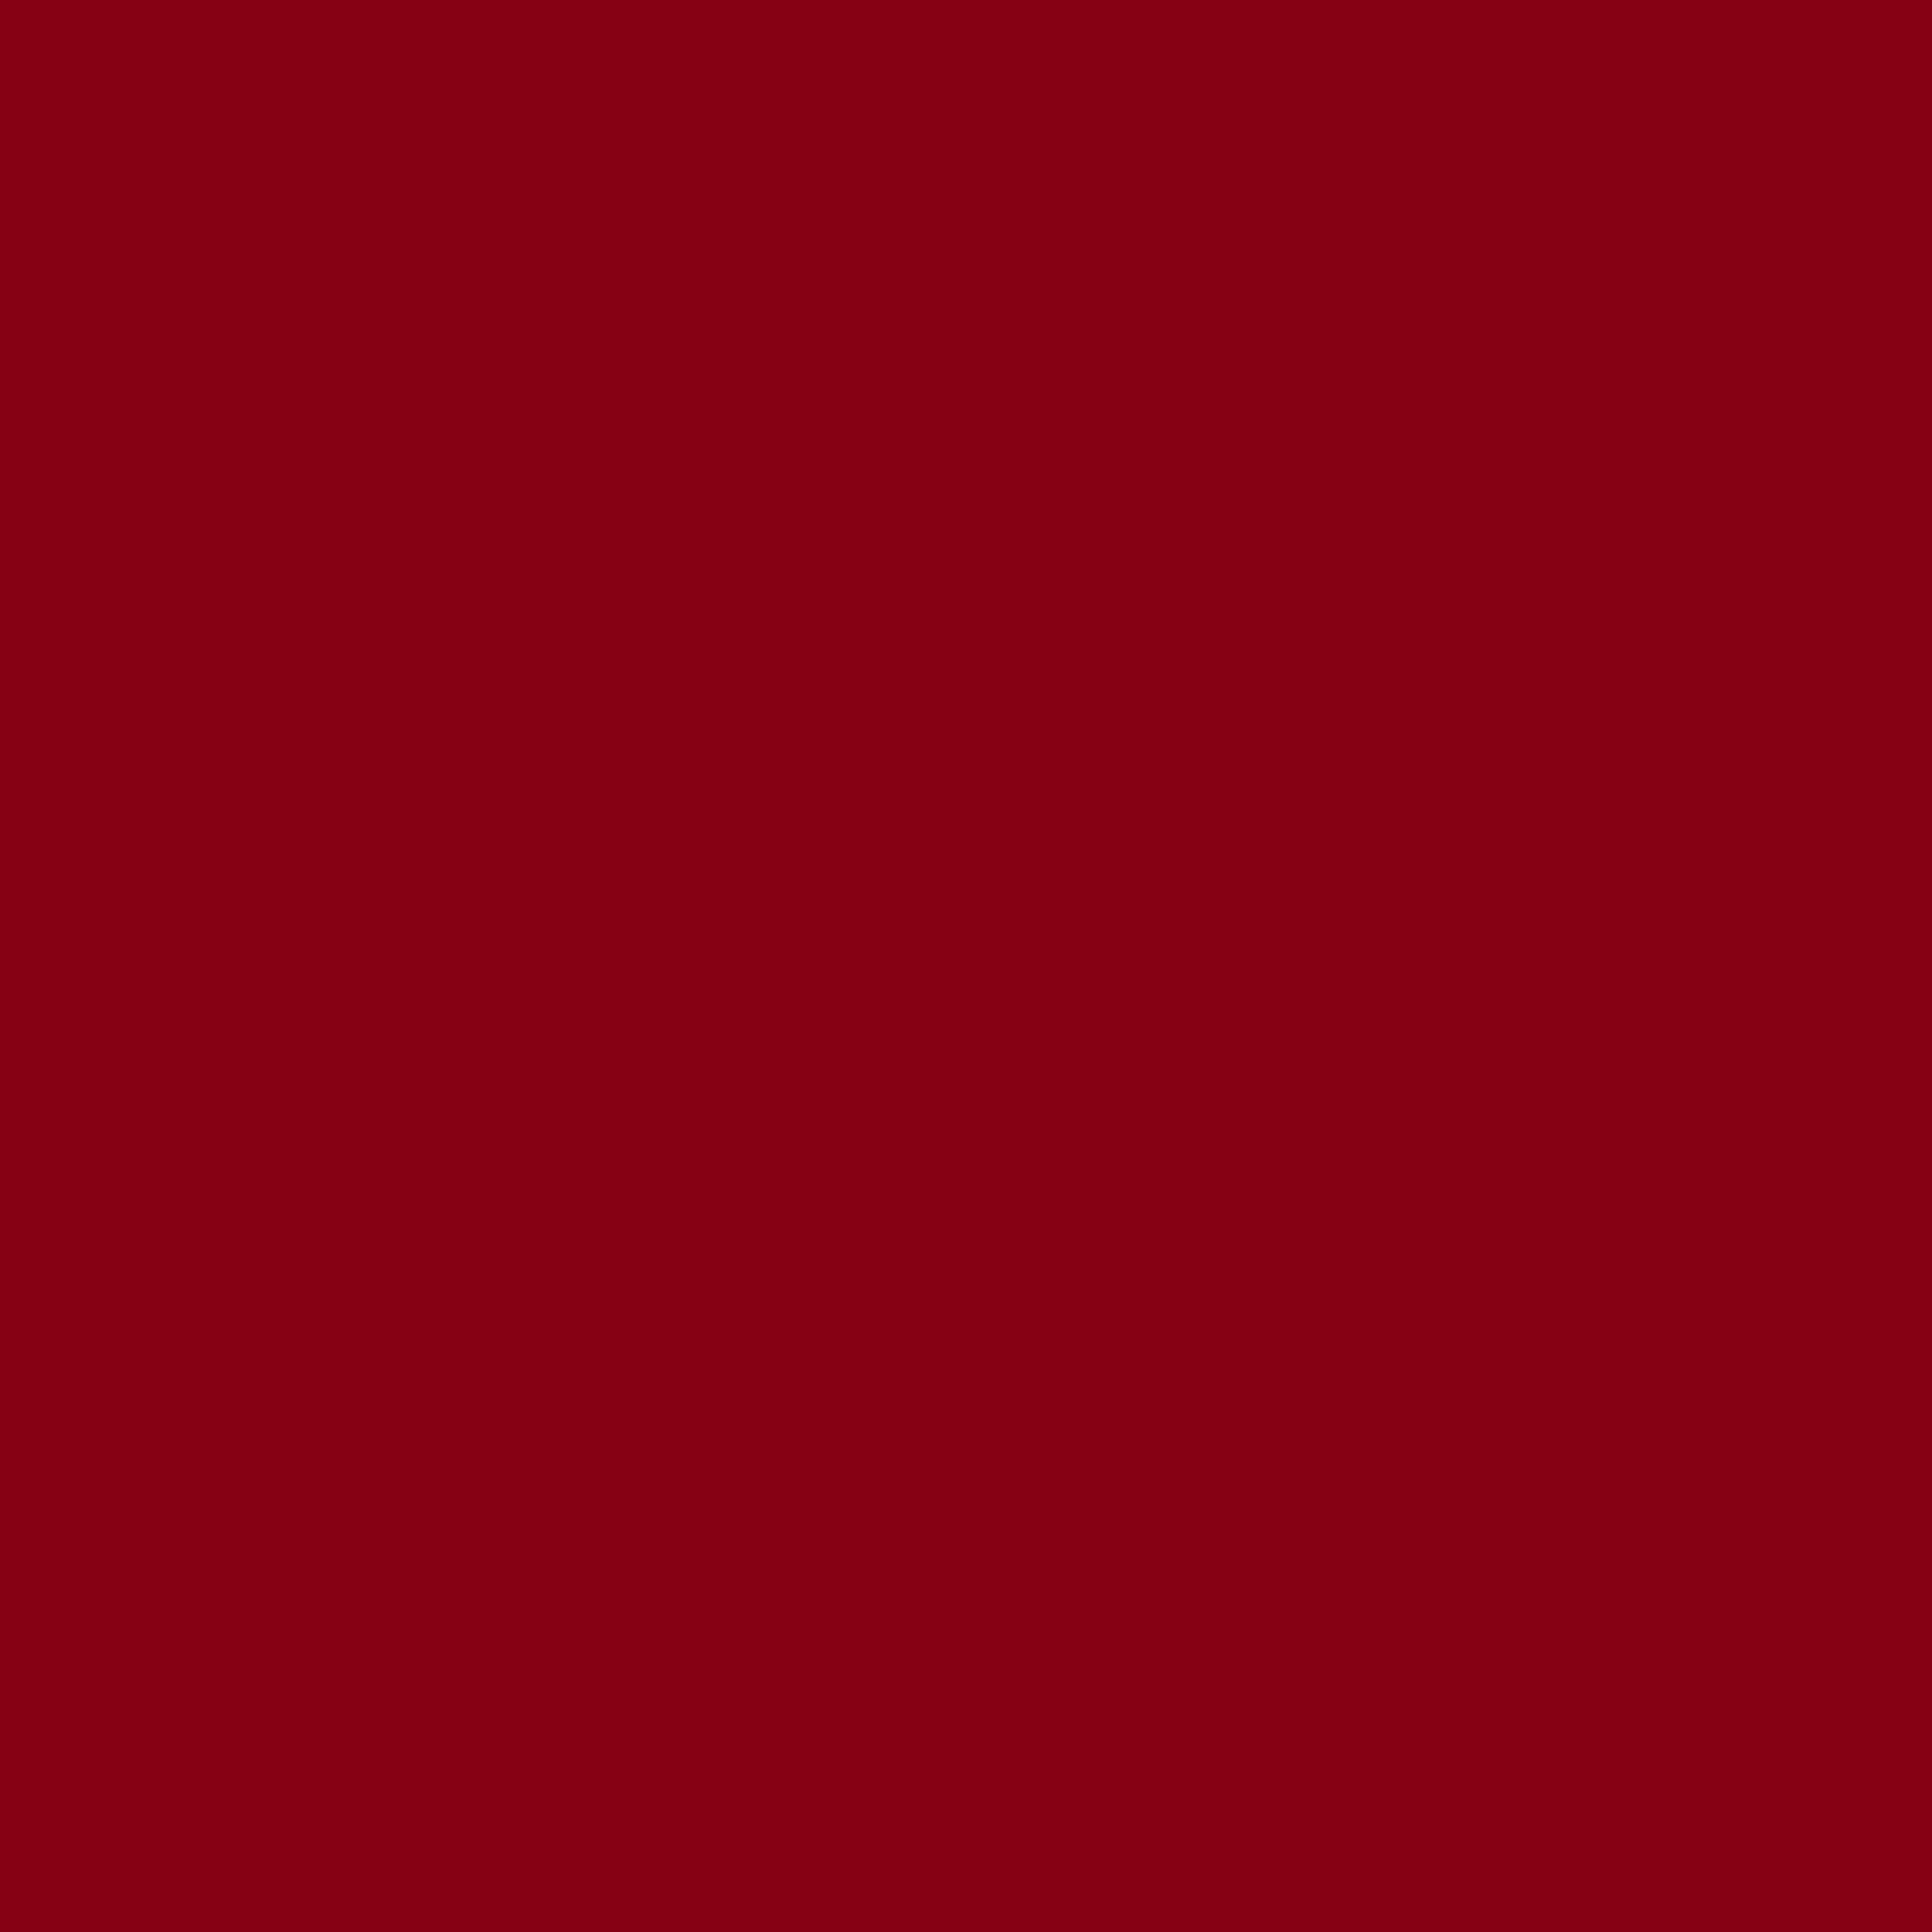 2048x2048 Red Devil Solid Color Background